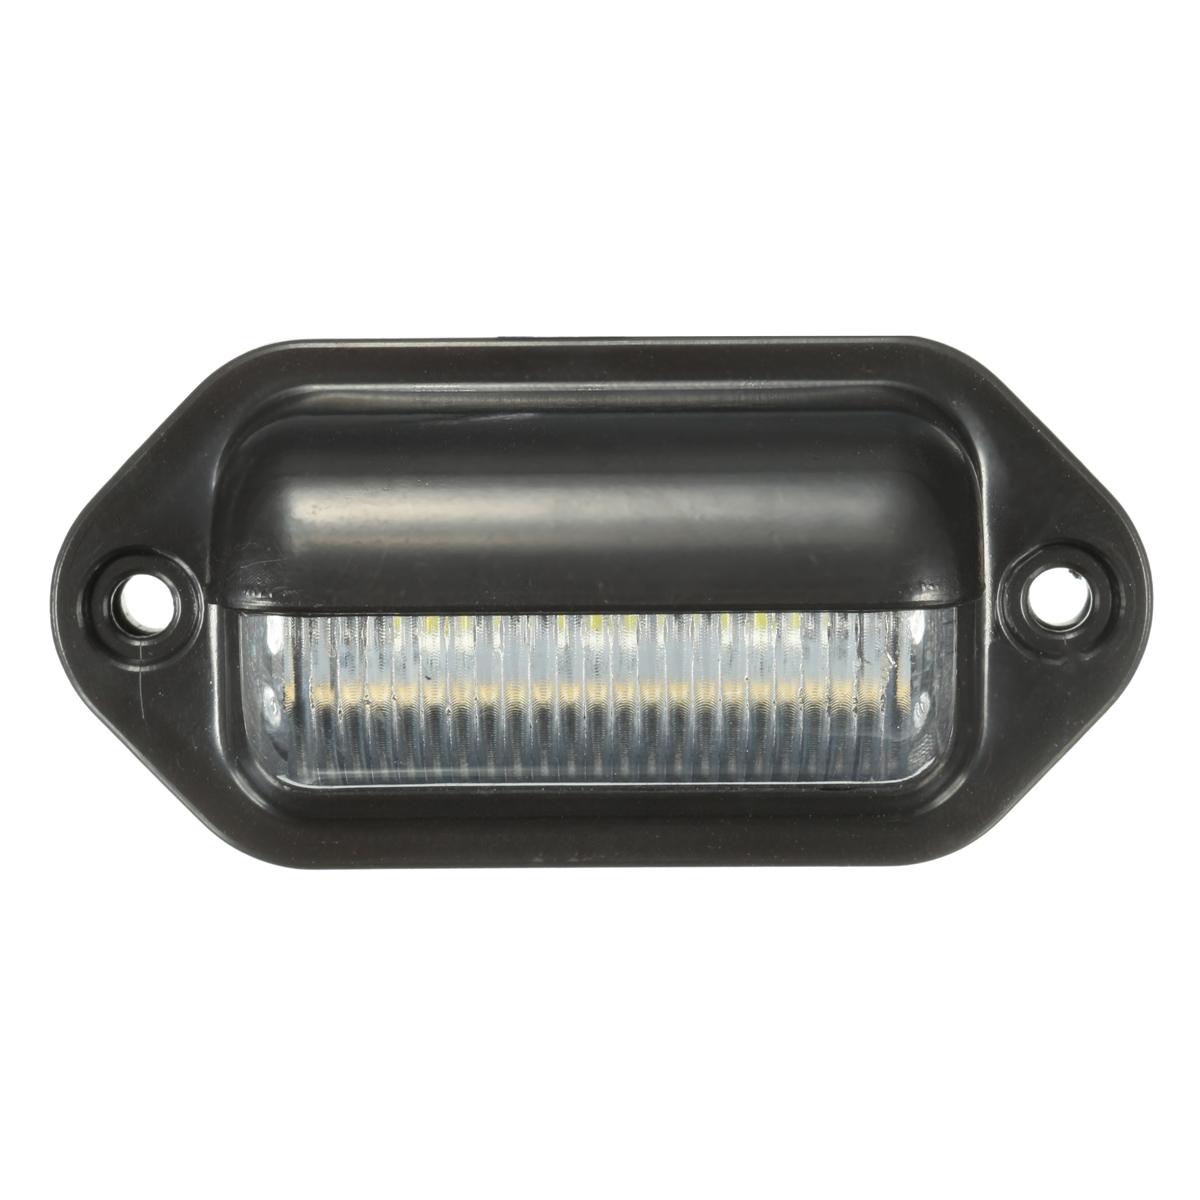 1030V 6 LED ABS License Plate Light Number Lighting Lorry